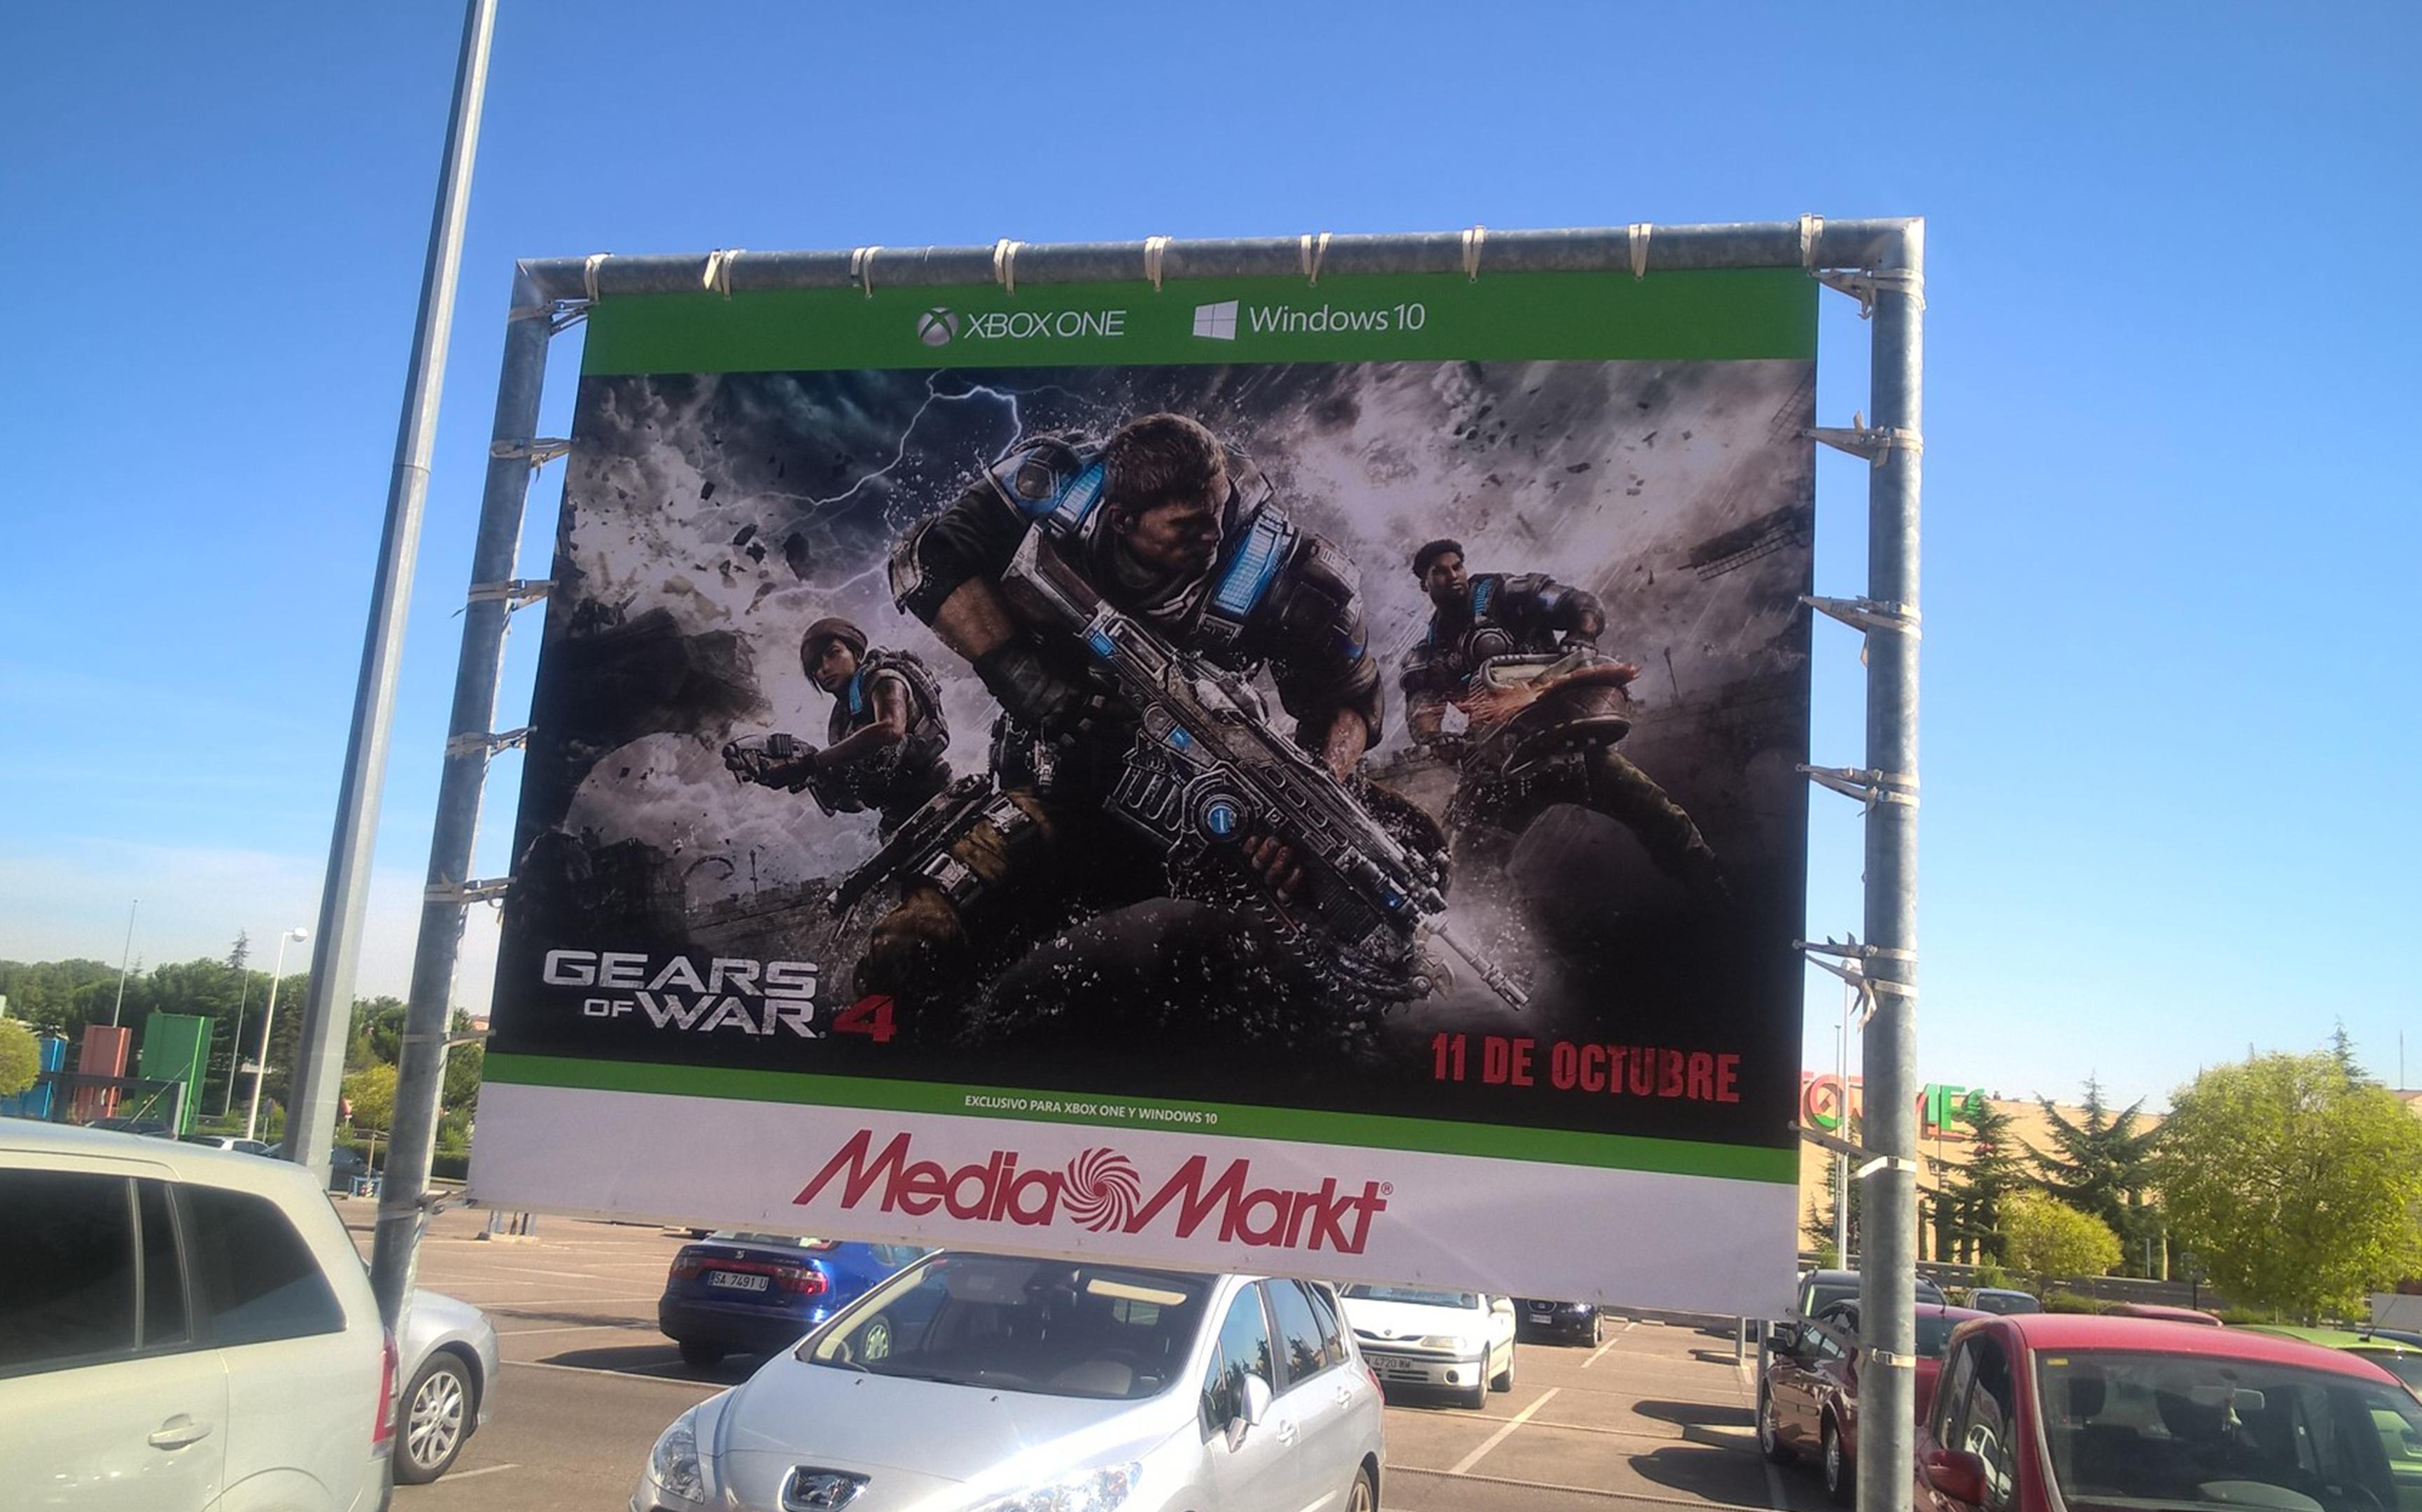 Cartel Gears of Wars Media Markt